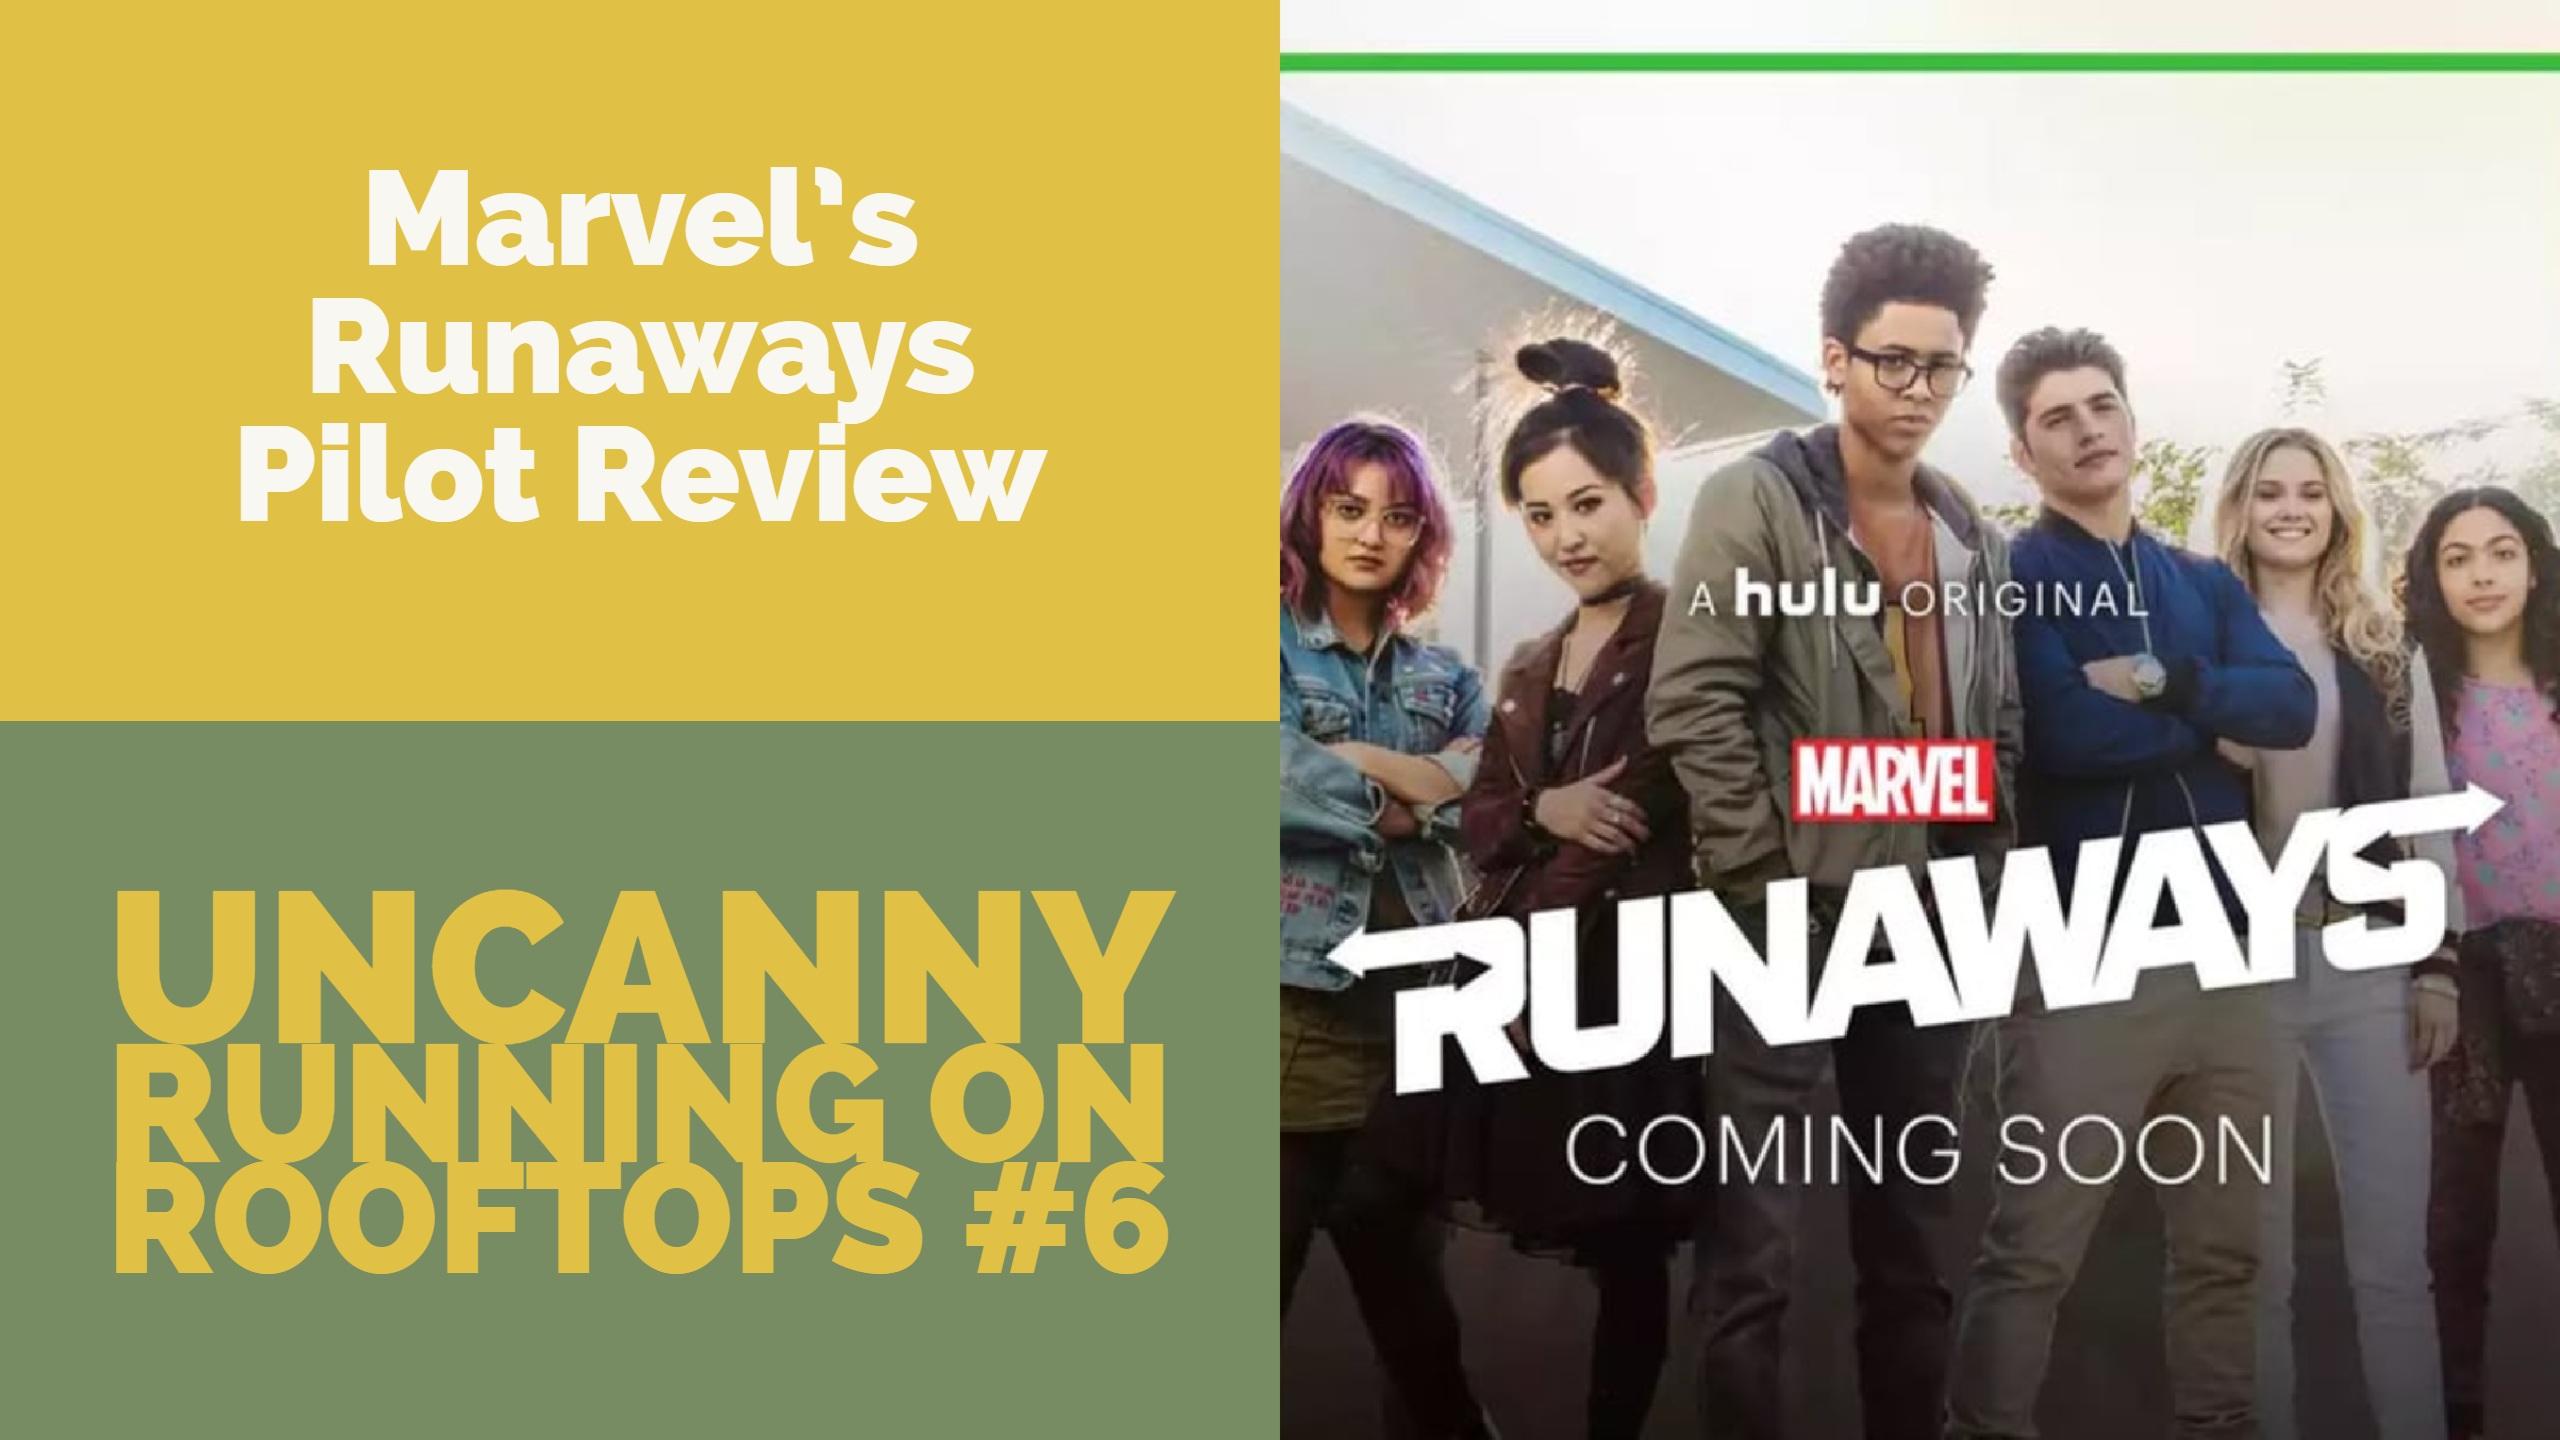 Marvel's Runaways Pilot